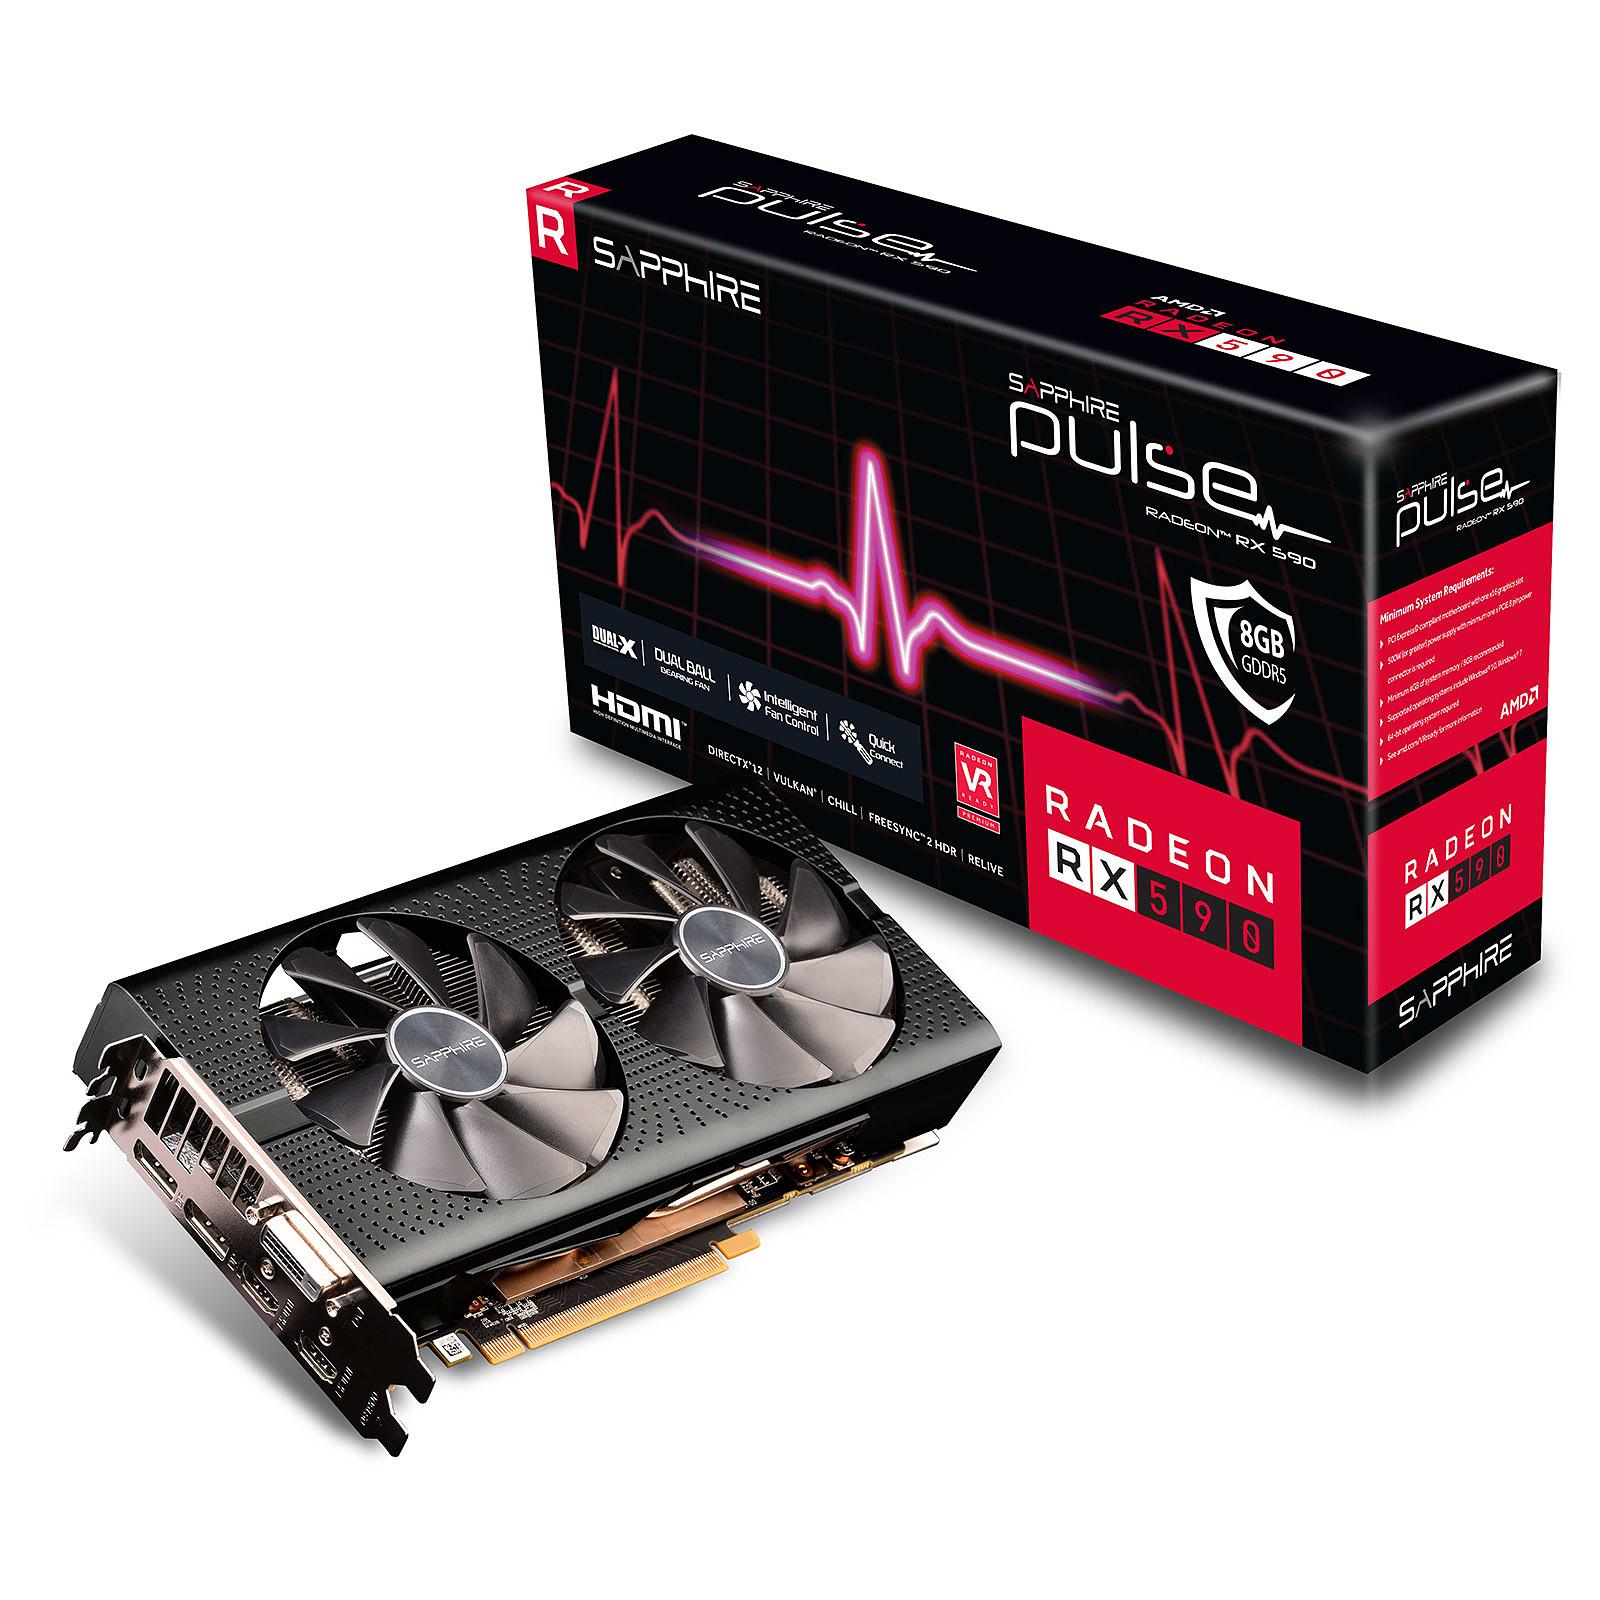 Sapphire PULSE Radeon RX 590 8G